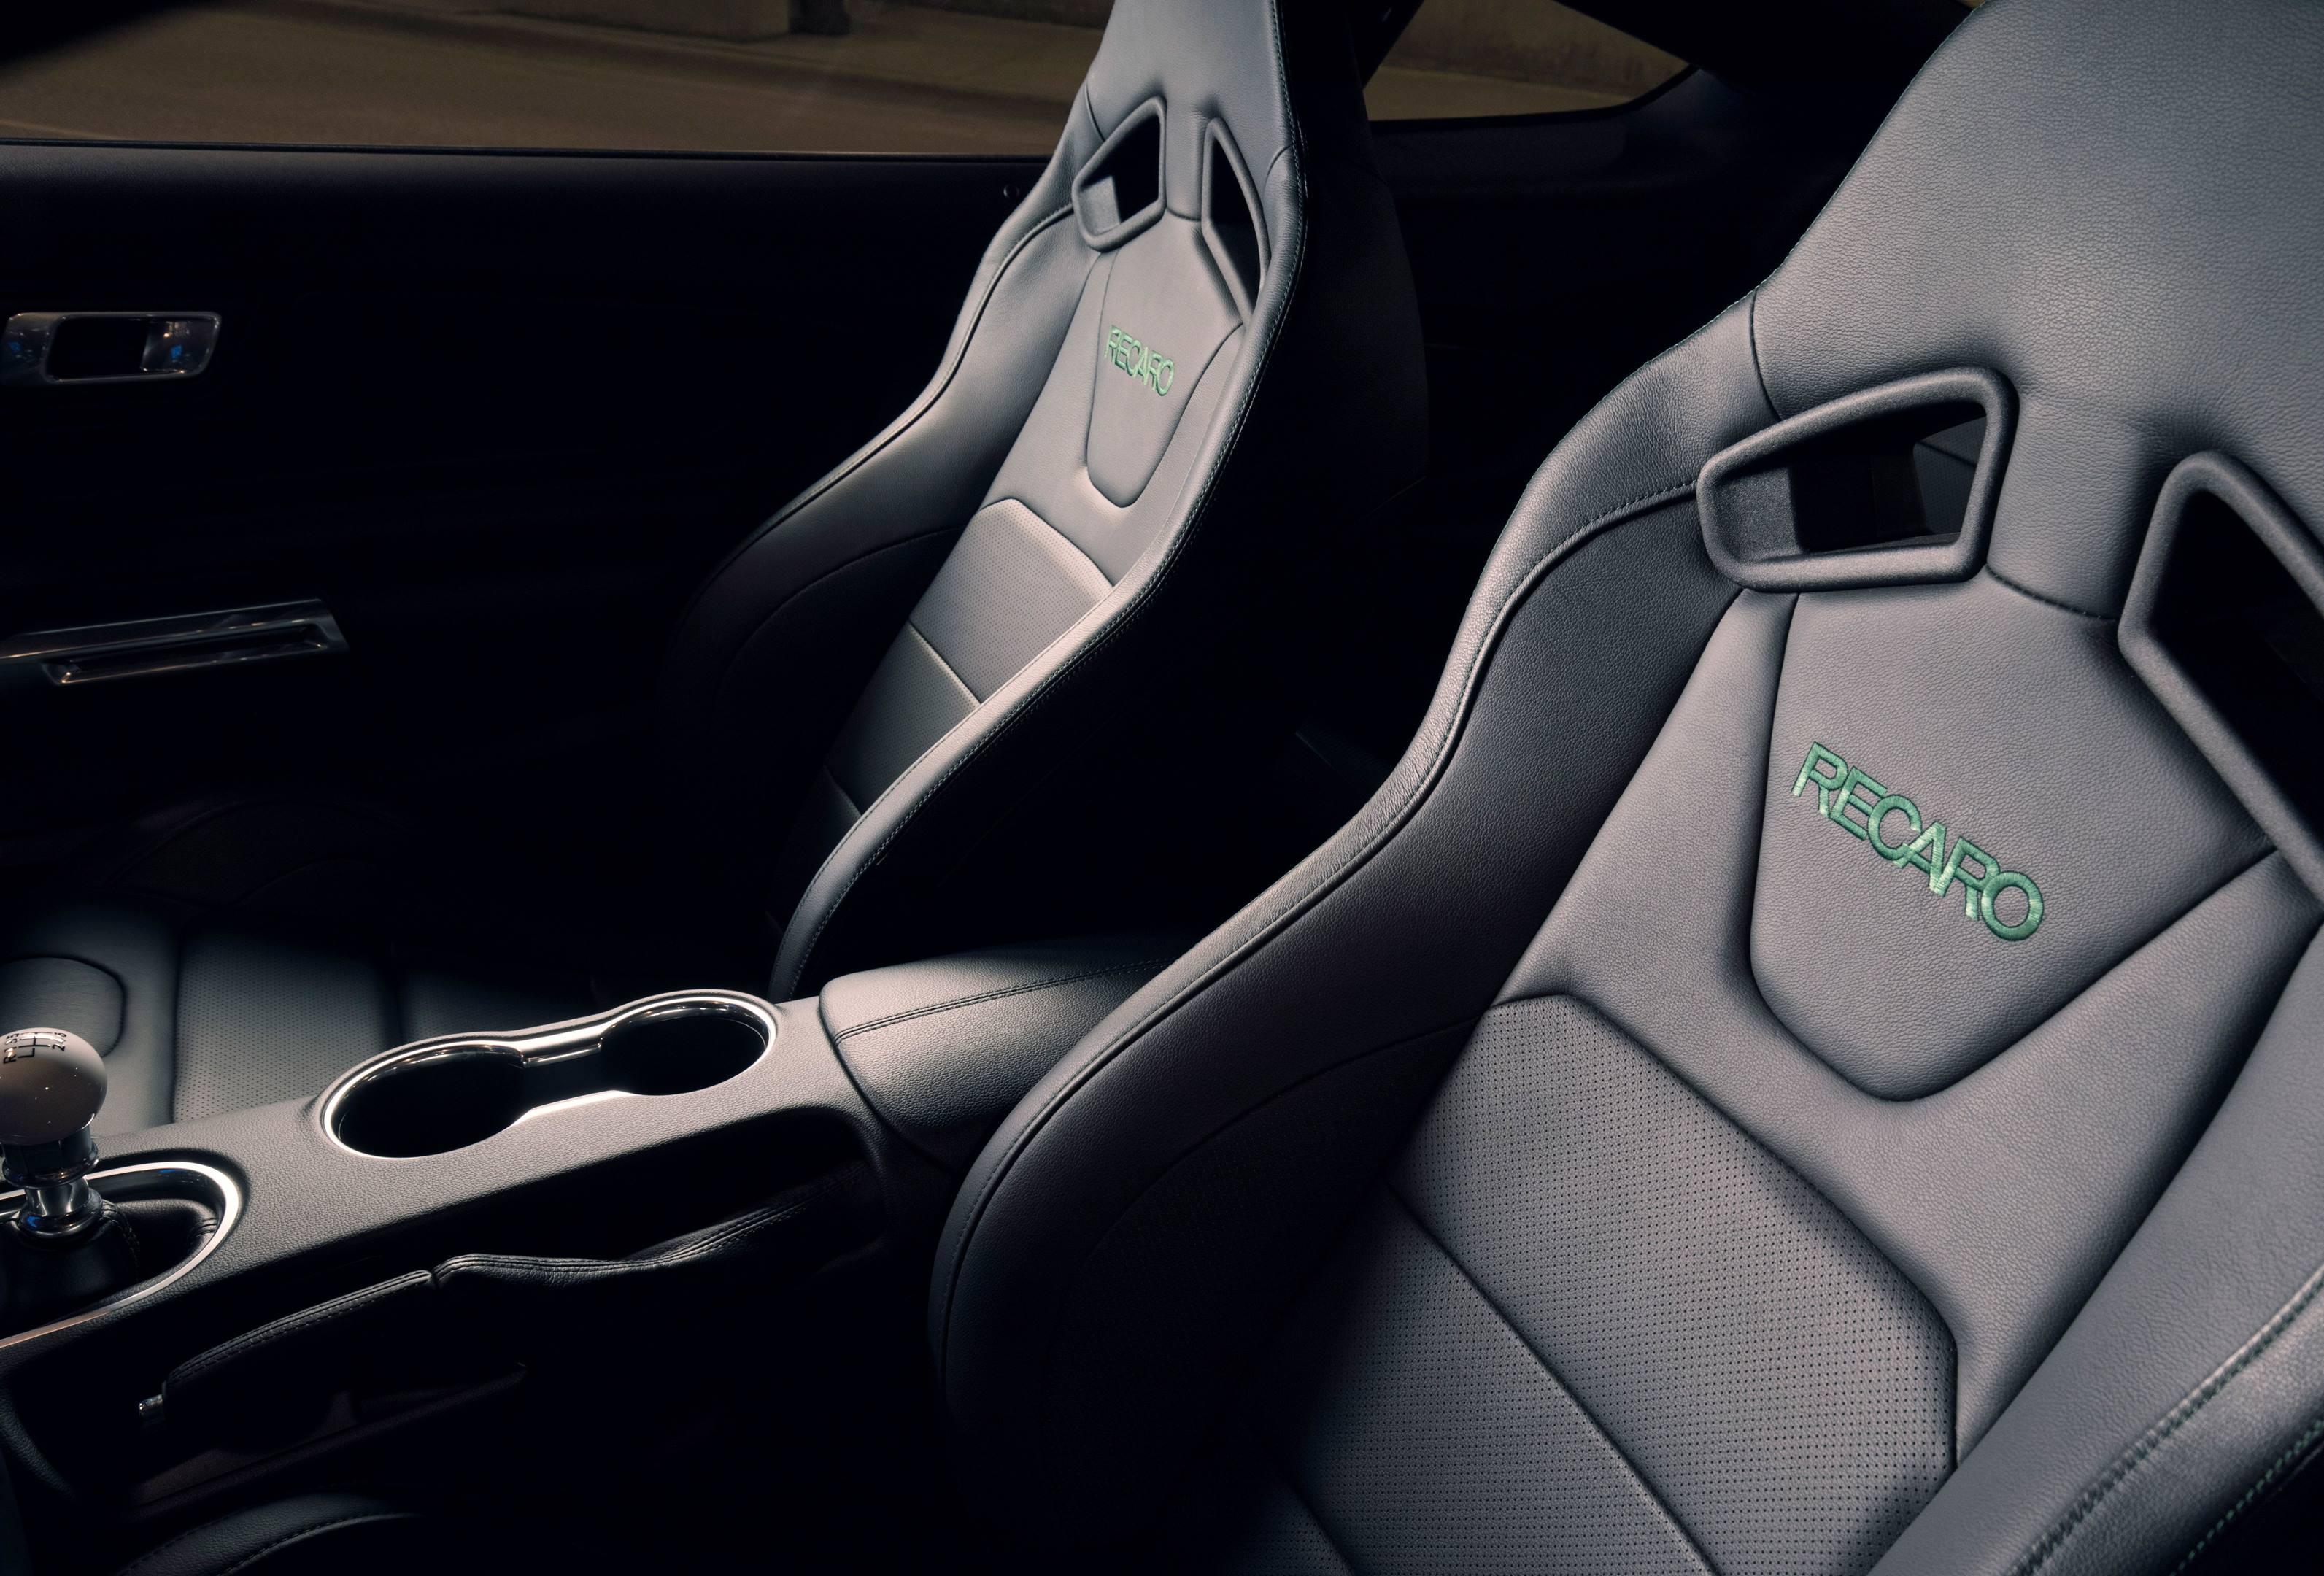 2019 Mustang Bullitt seat detail